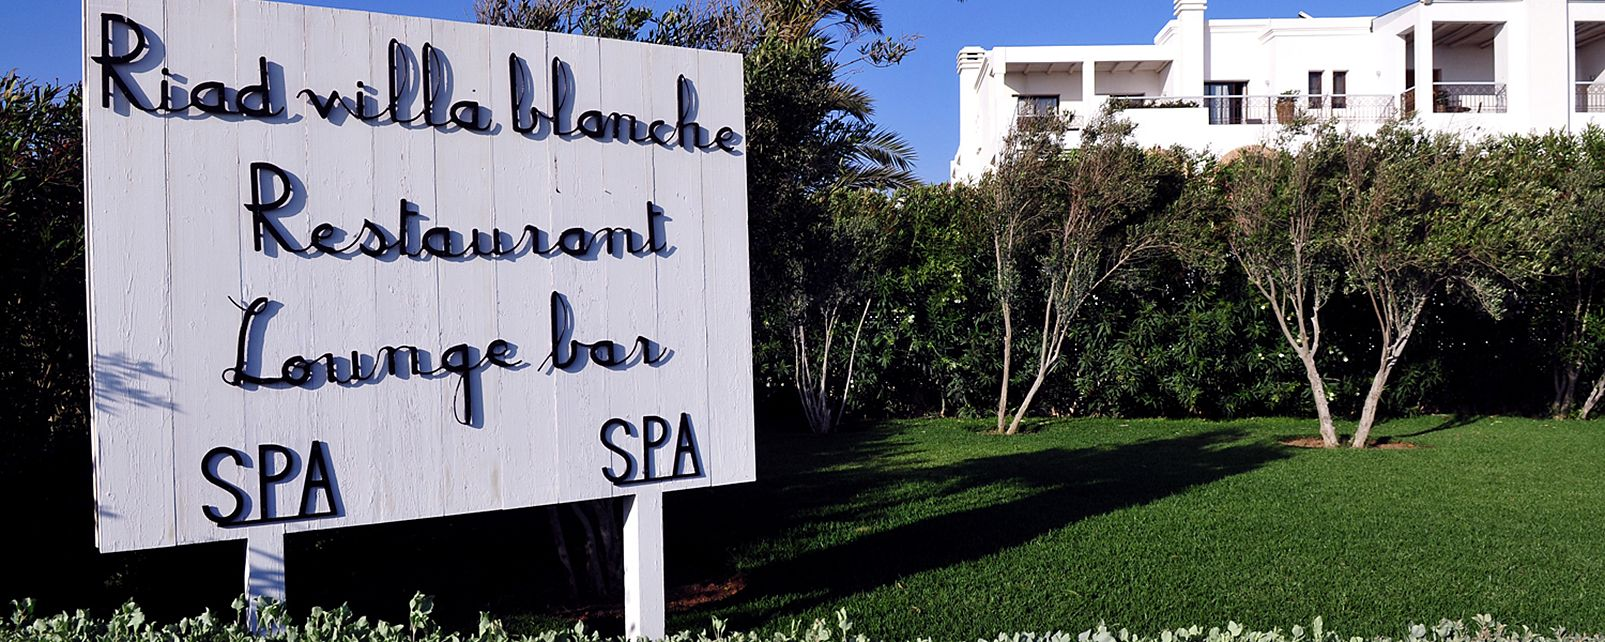 Hôtel Riad Villa Blanche